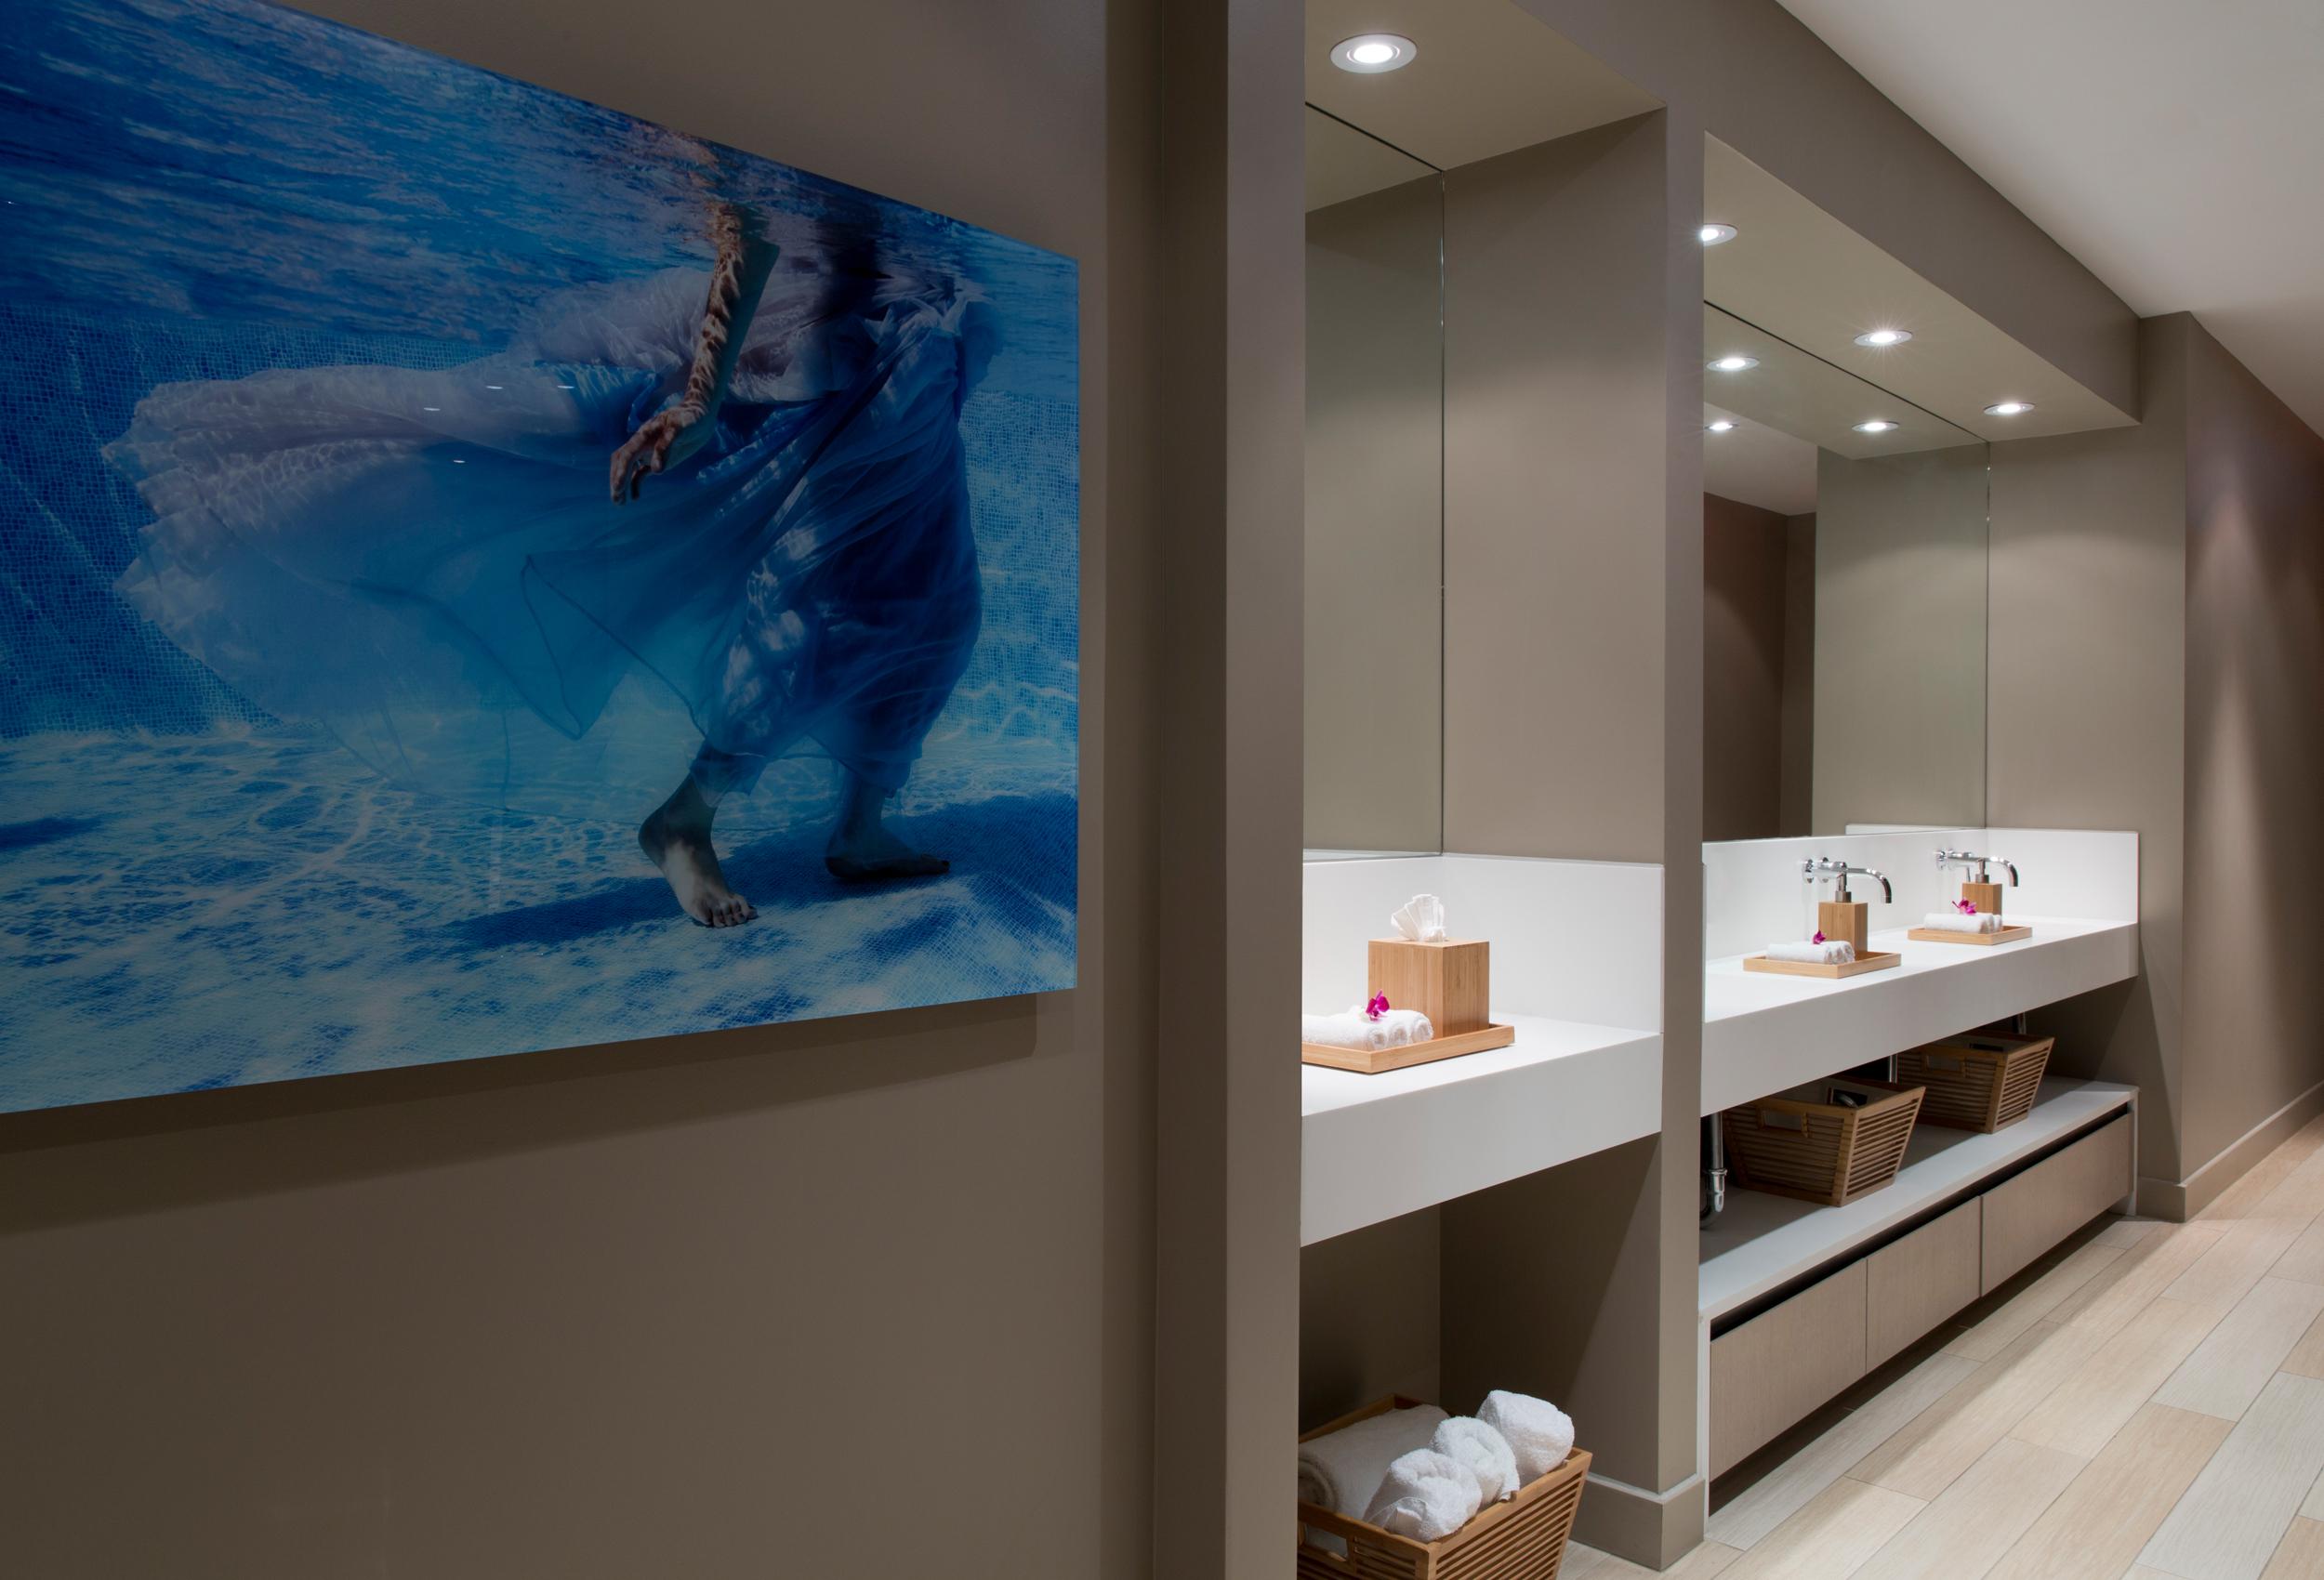 Oni-One-Hospitality-Taboo-Change-Room.jpg